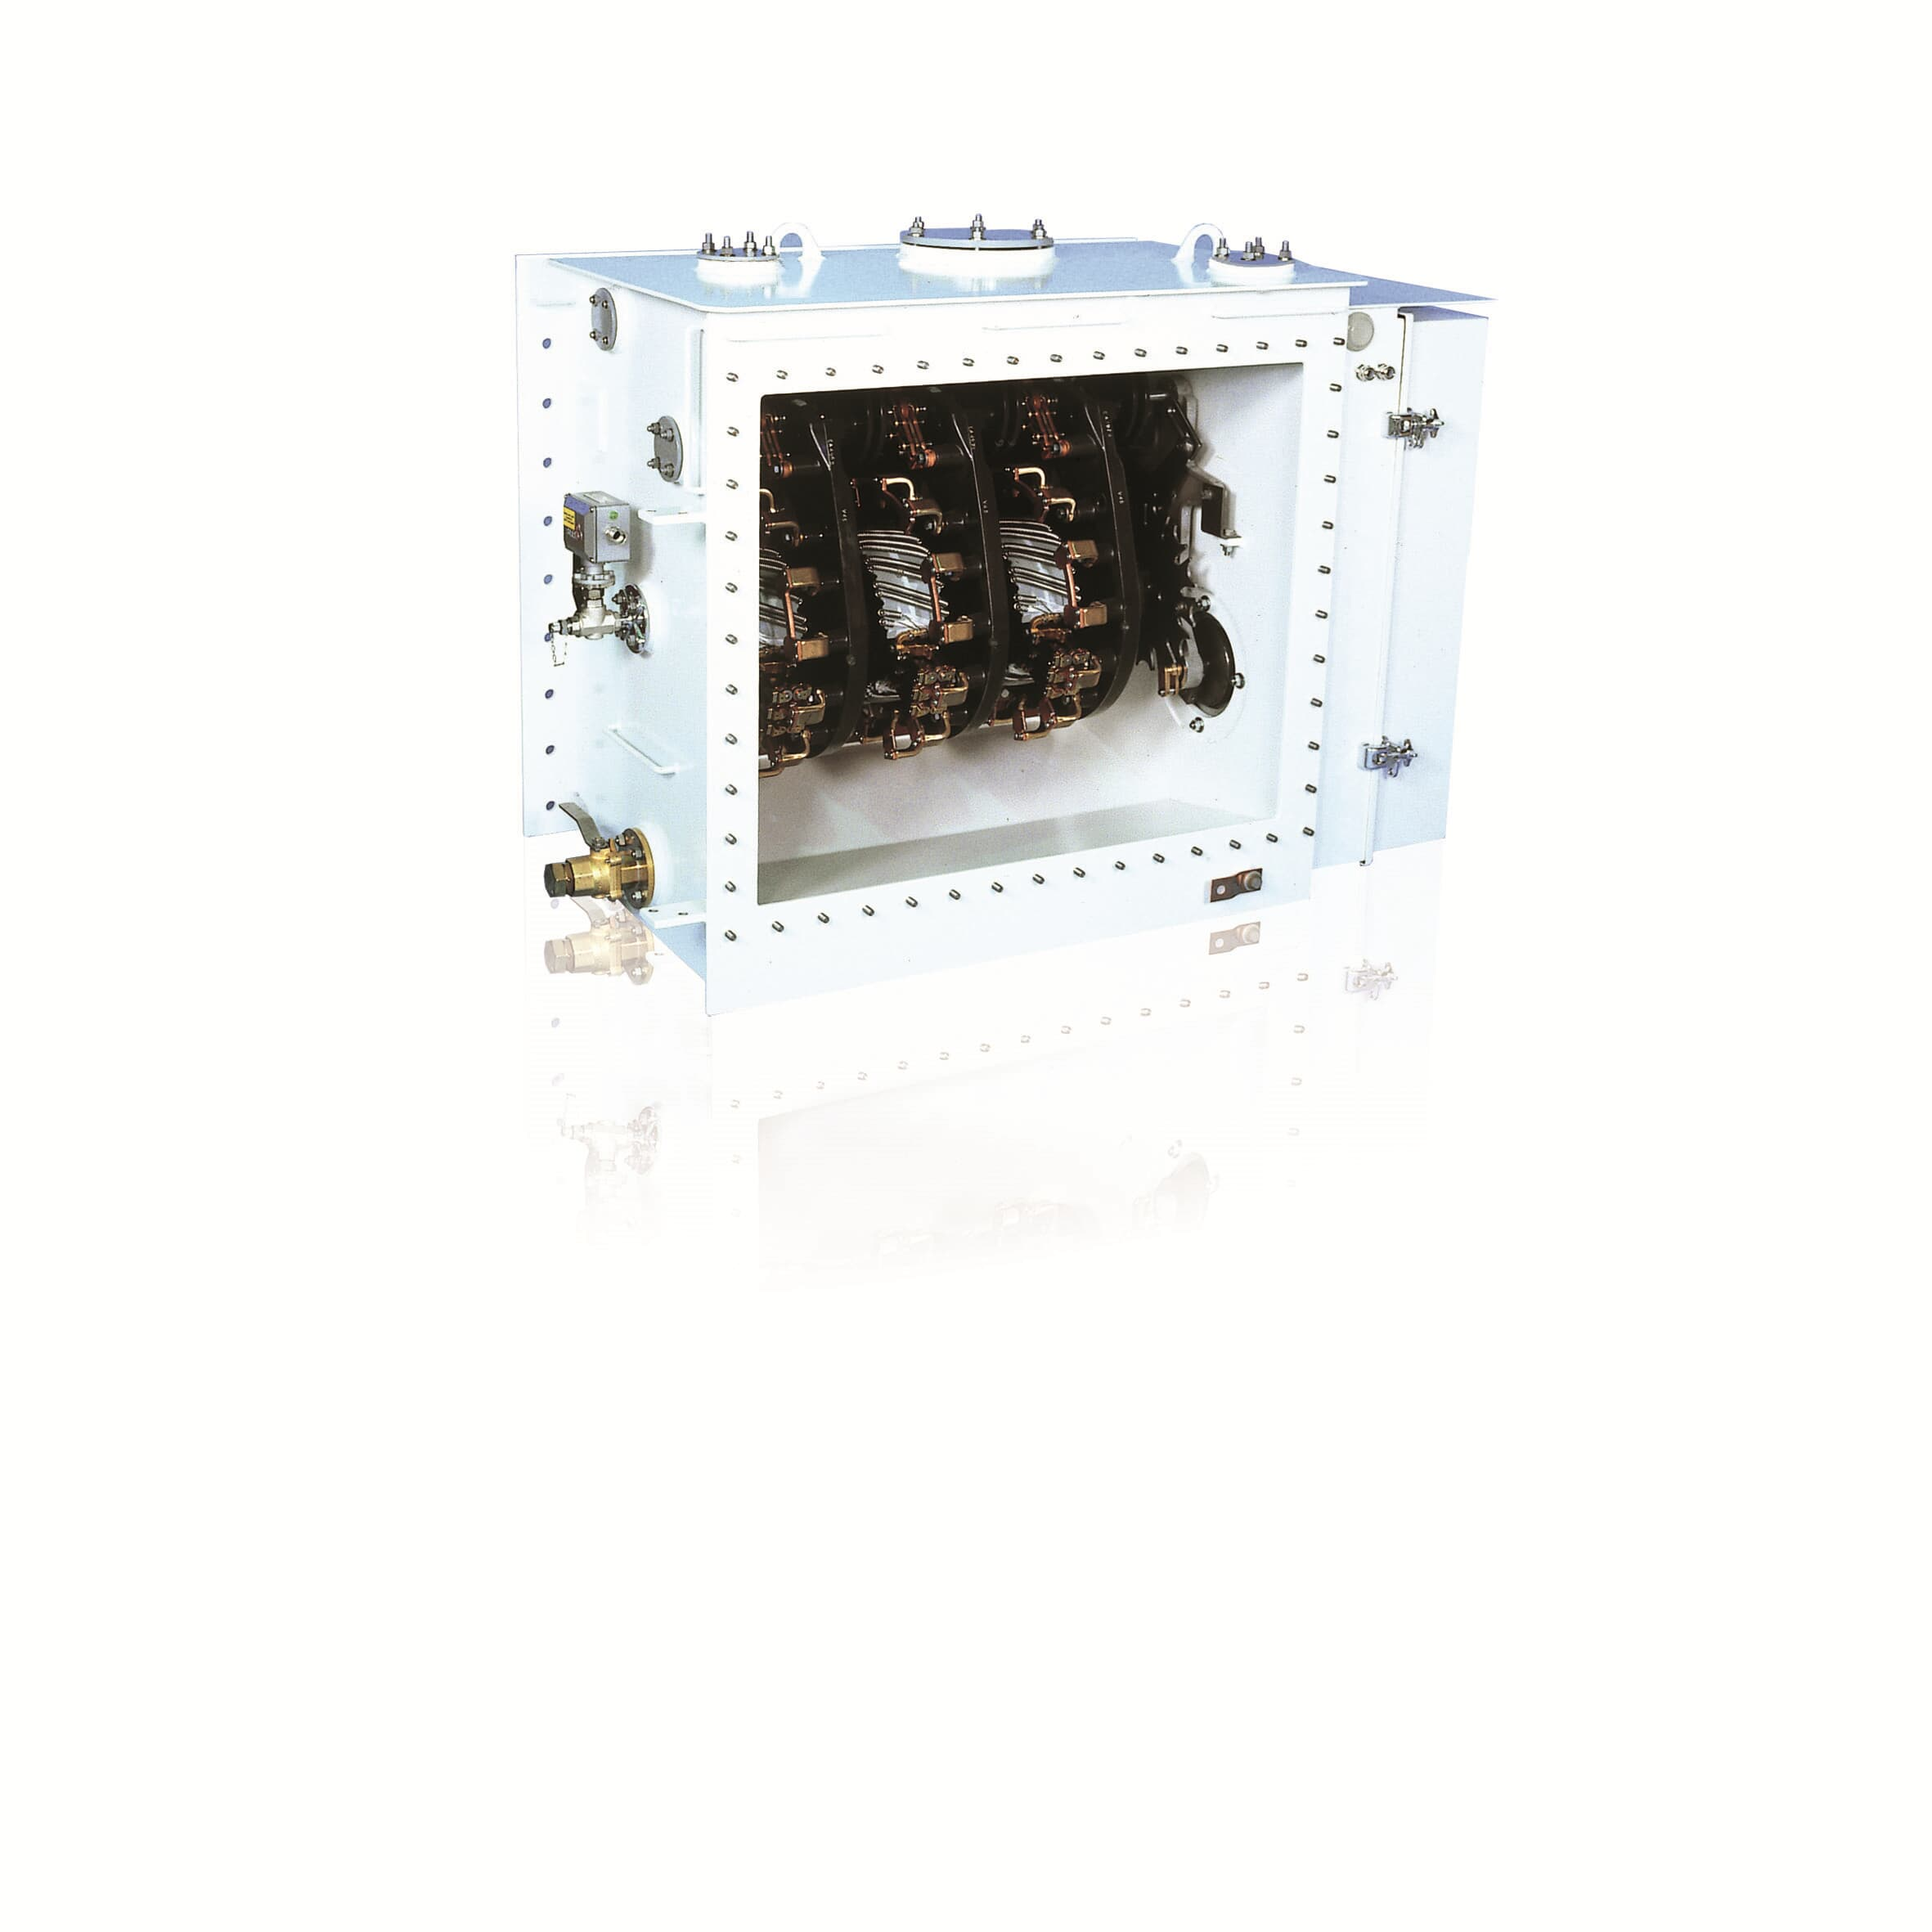 Tipo UZ (on-tank) 145 kV y 110 MVA w/ motor-drive BUF3